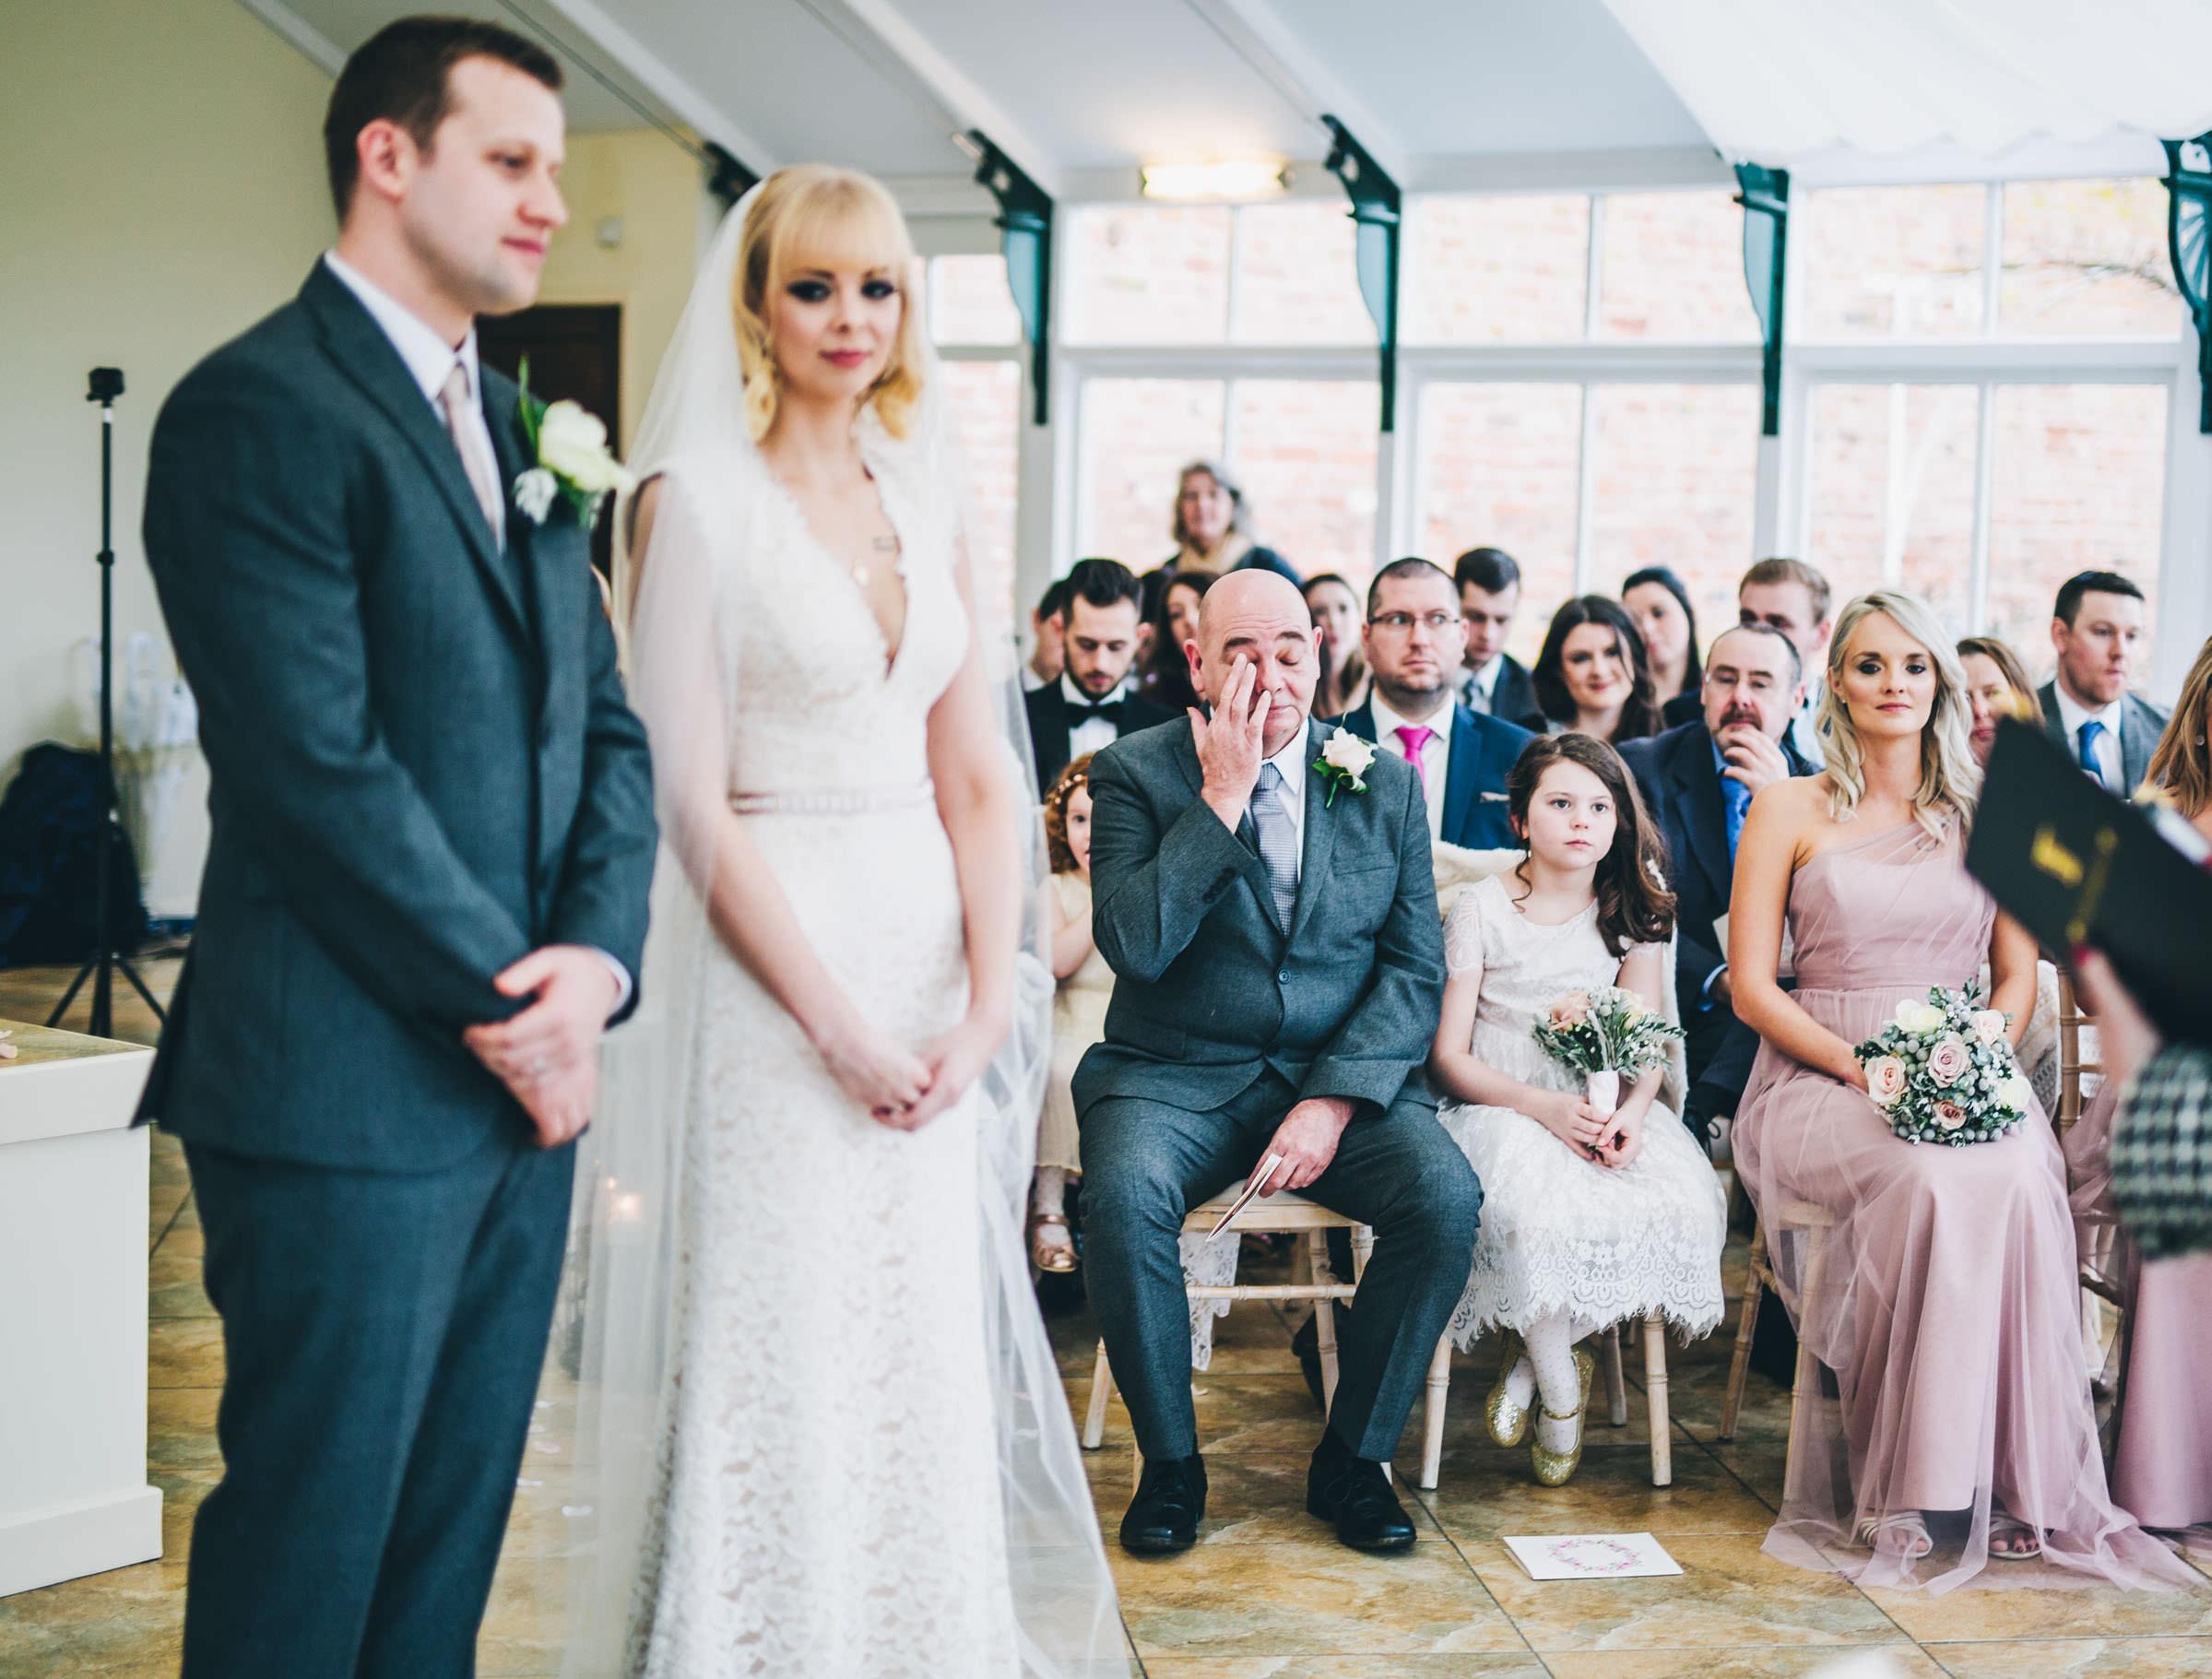 emotional dad - wedding ceremony